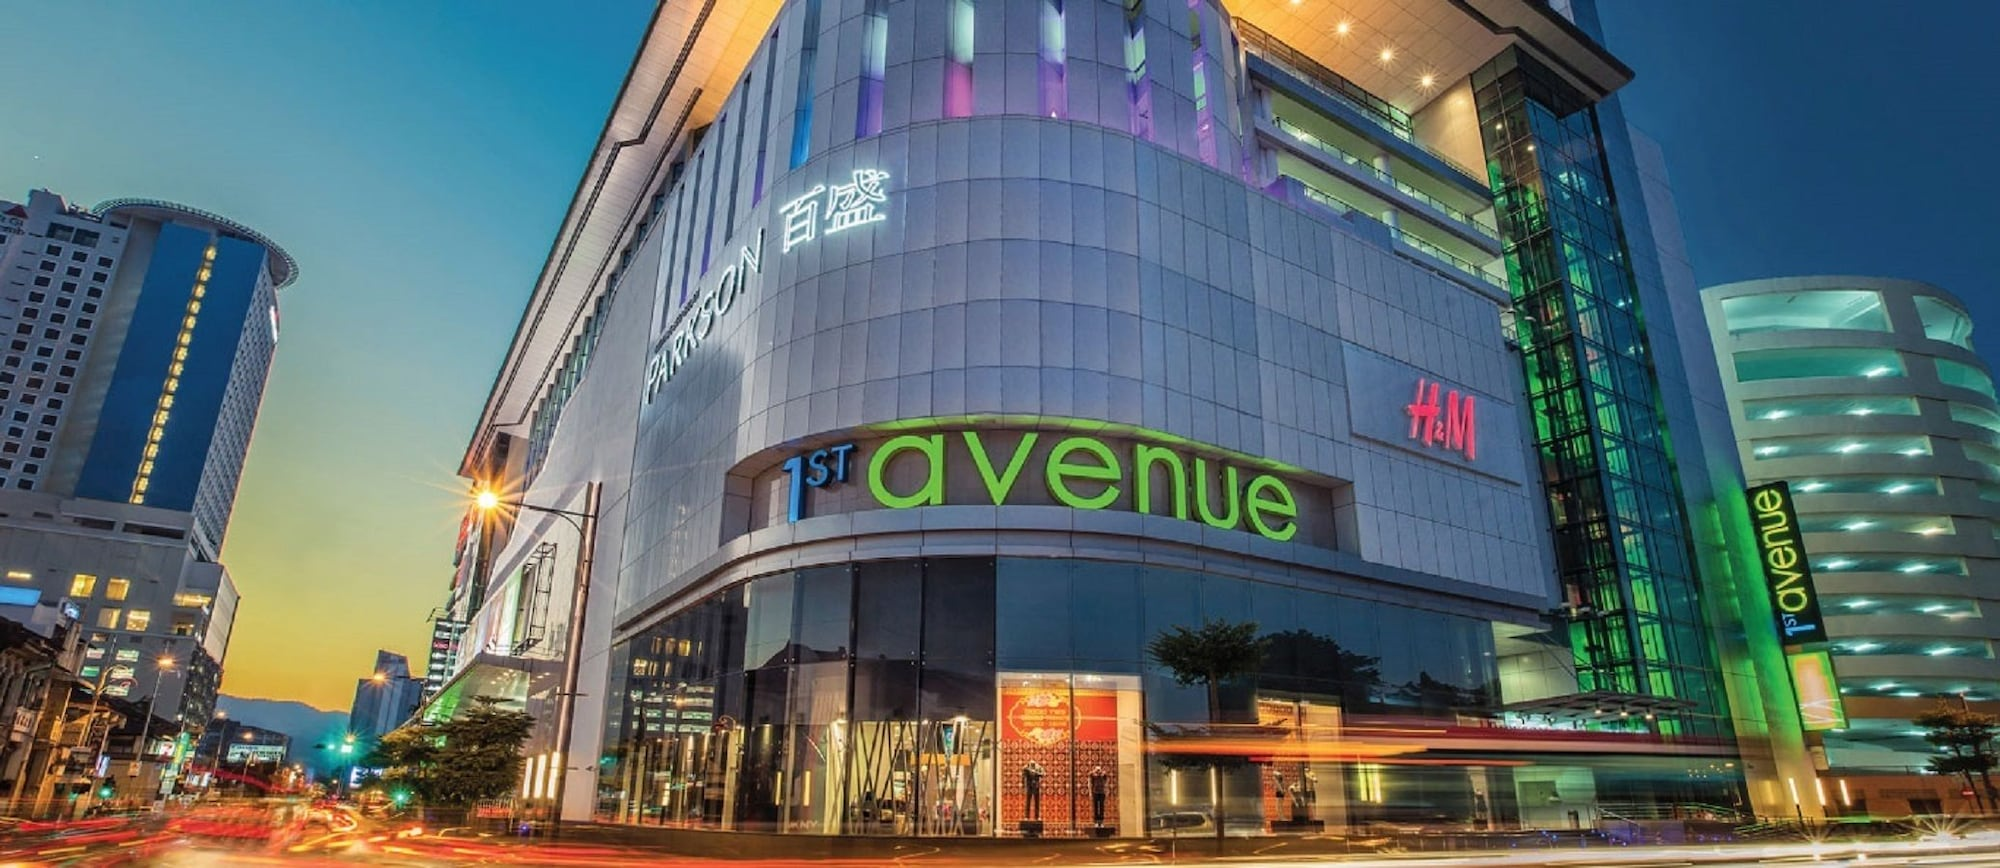 Apple 1 Hotel Times Square, Pulau Penang